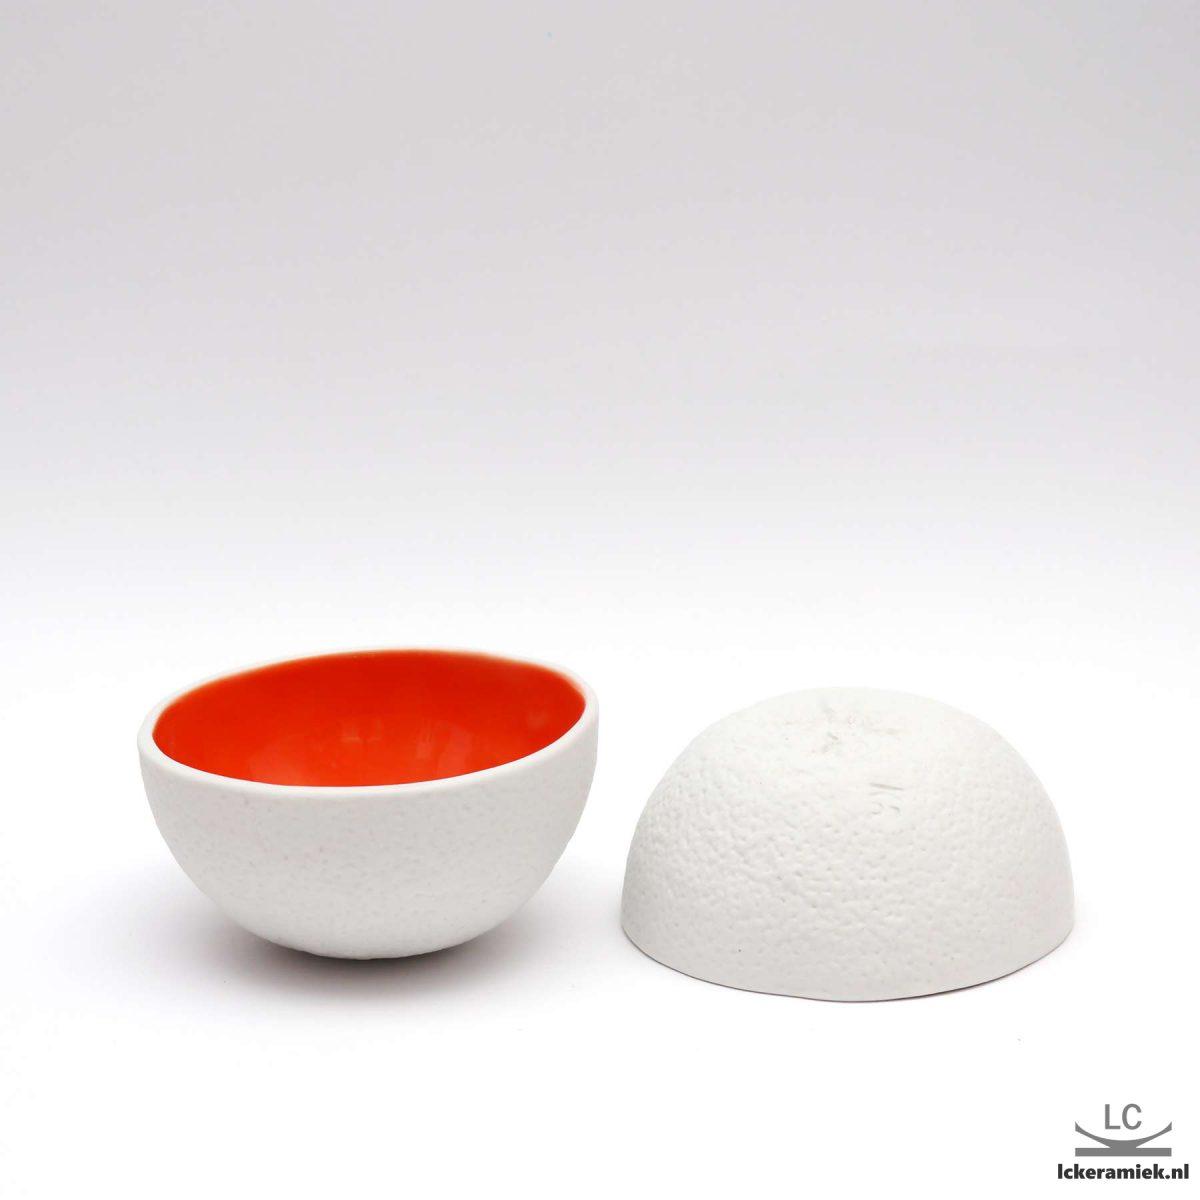 porseleinen schaaltje sinaasappel